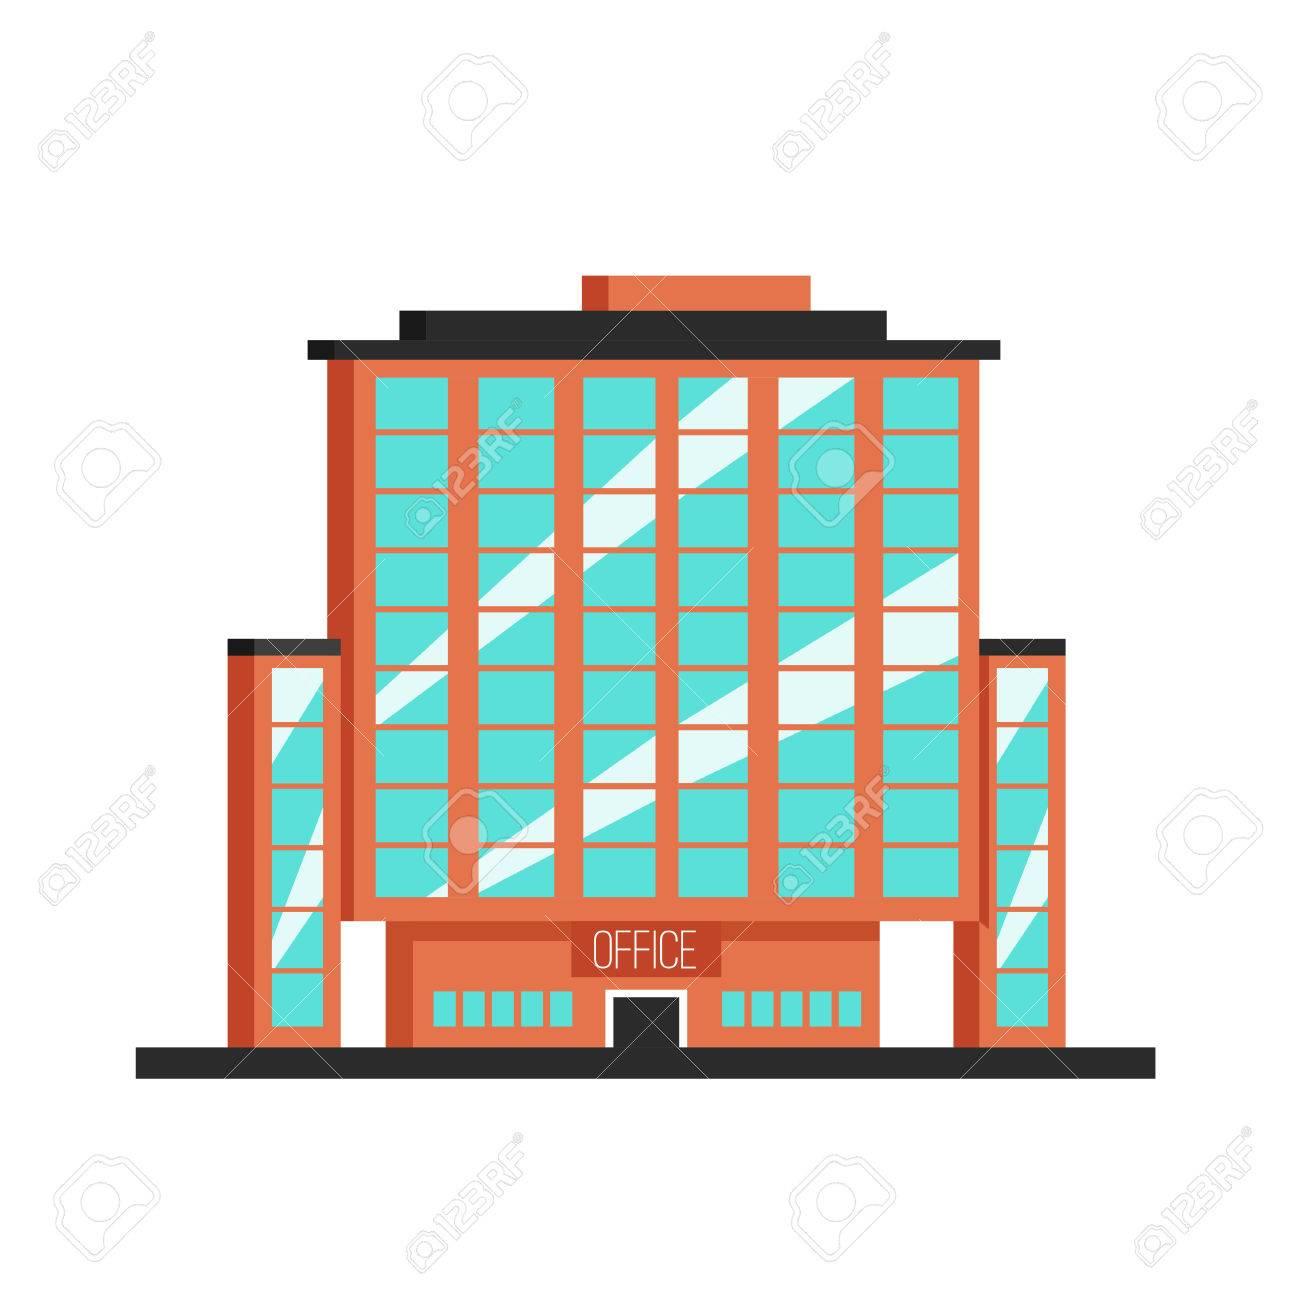 Office Building Flat Vector Illustration Constructivism Style